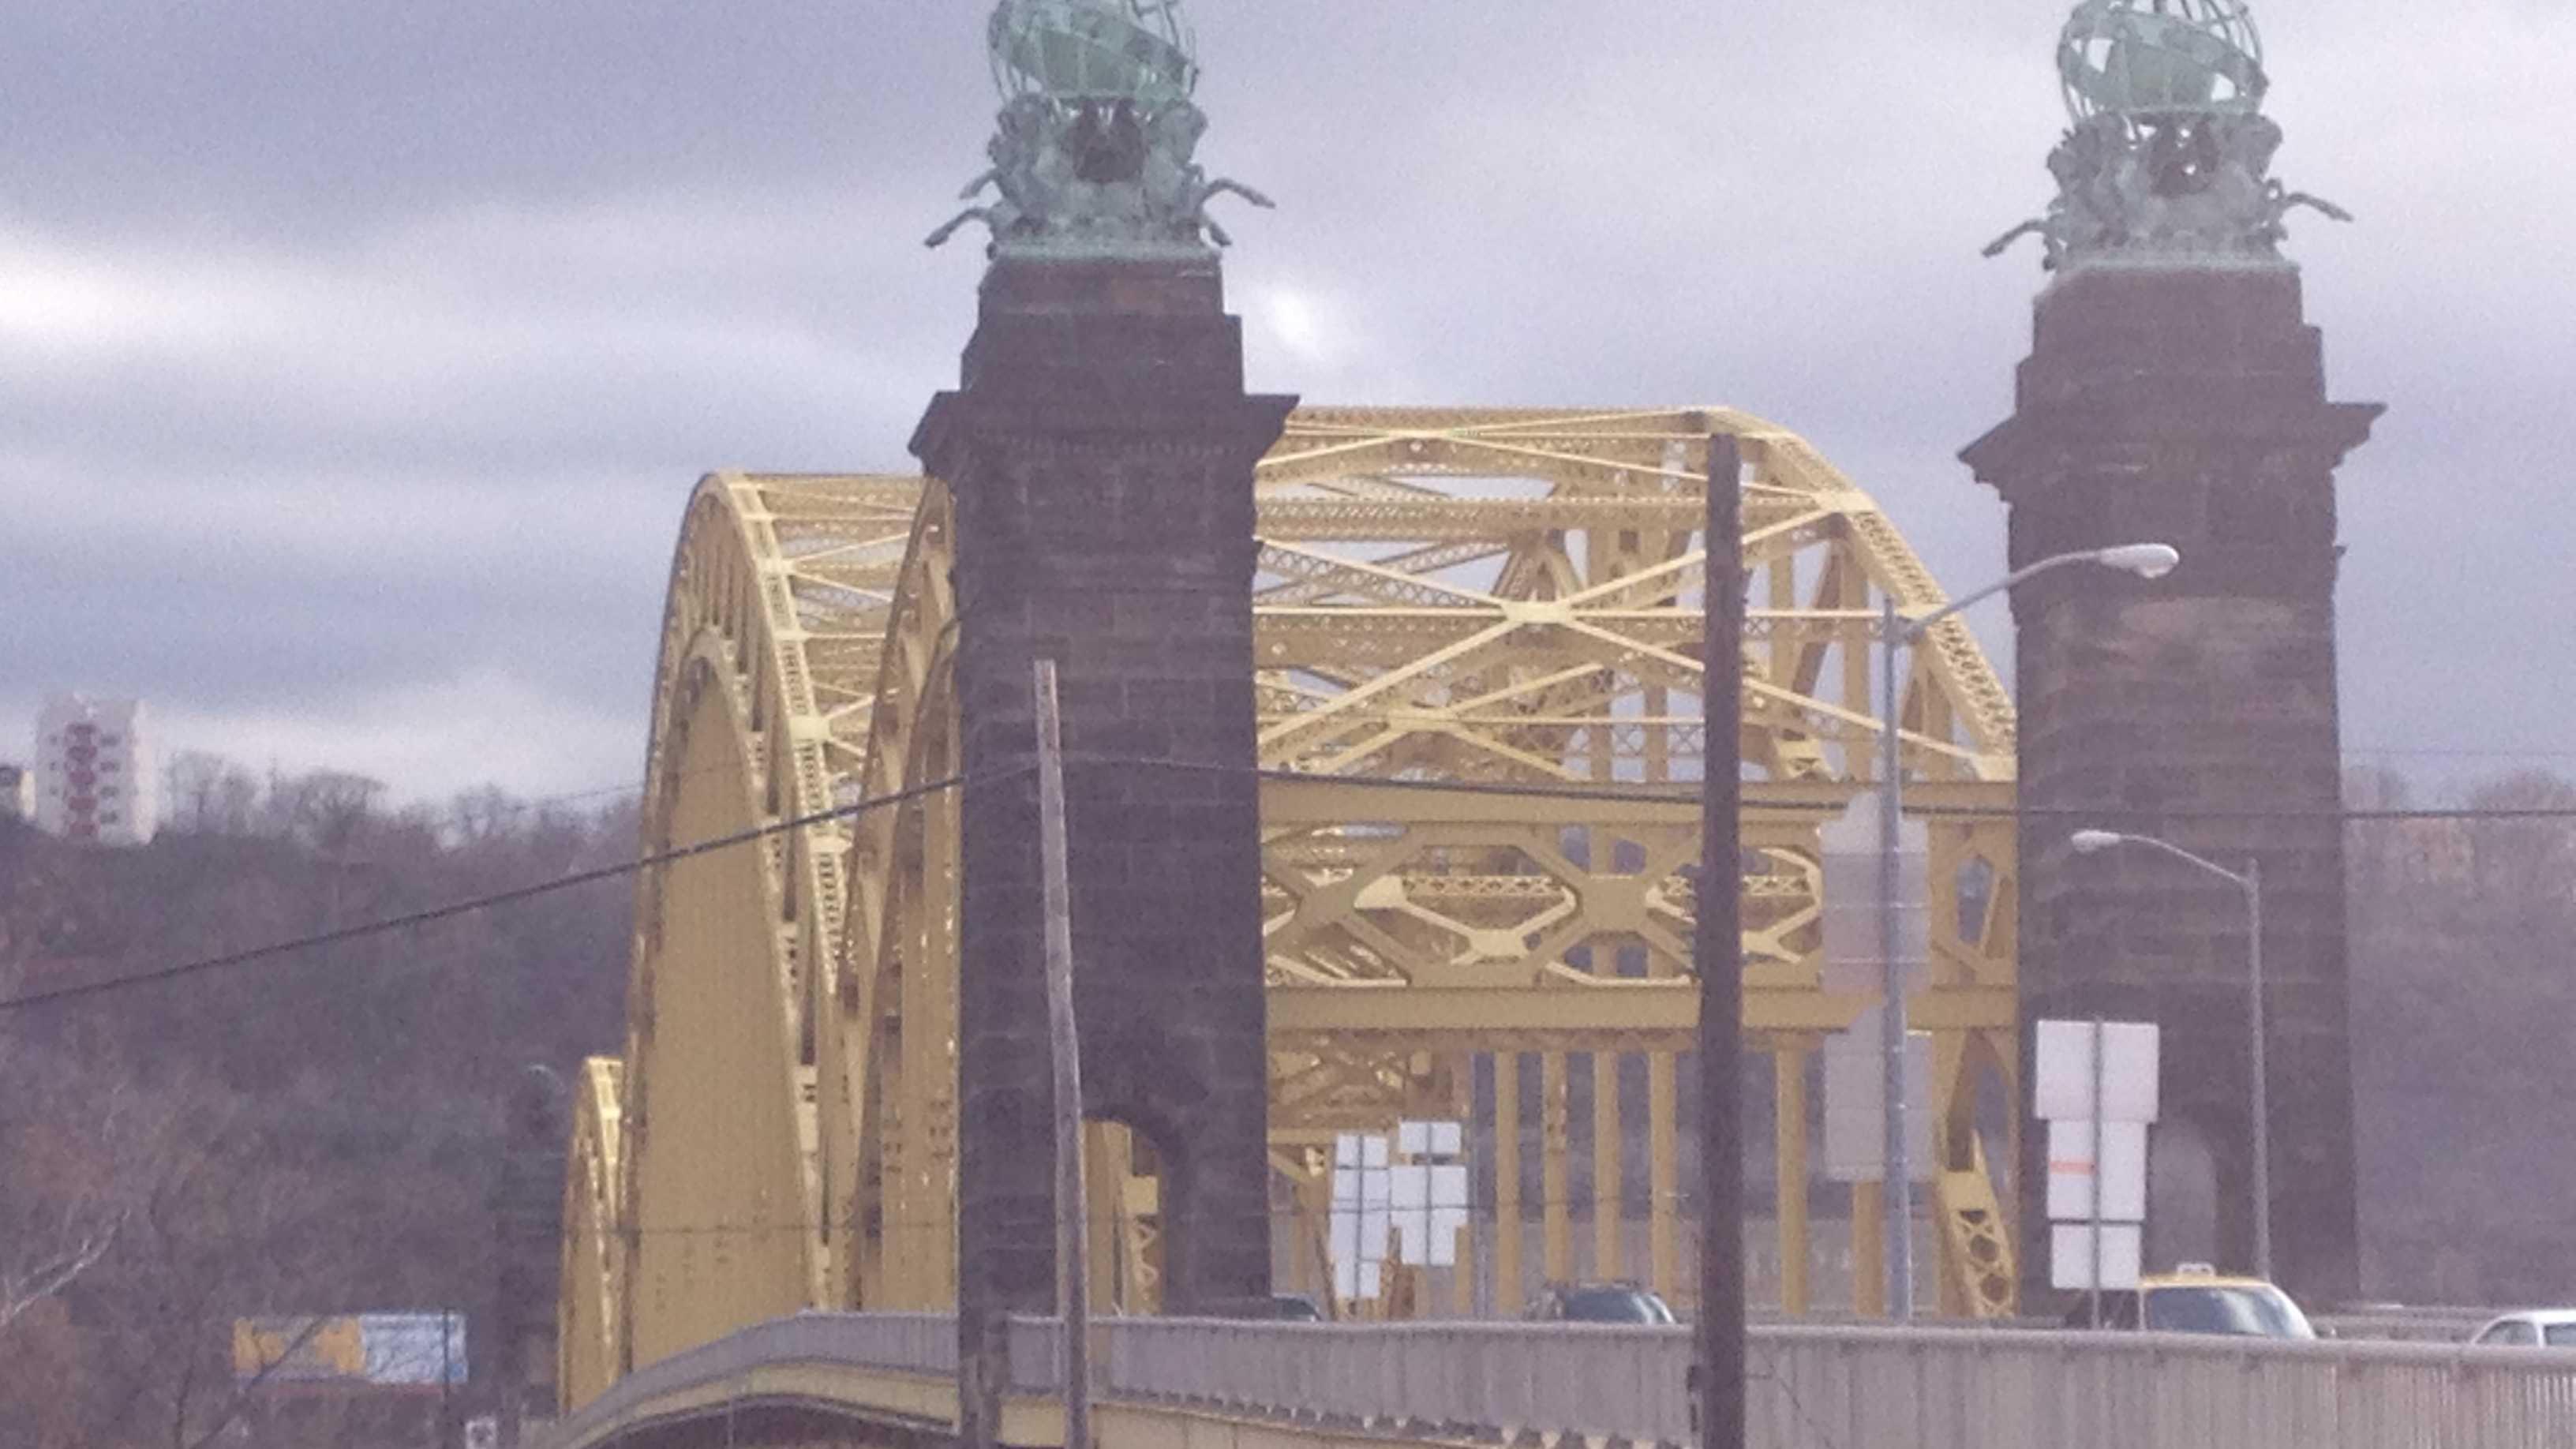 16th St. Bridge